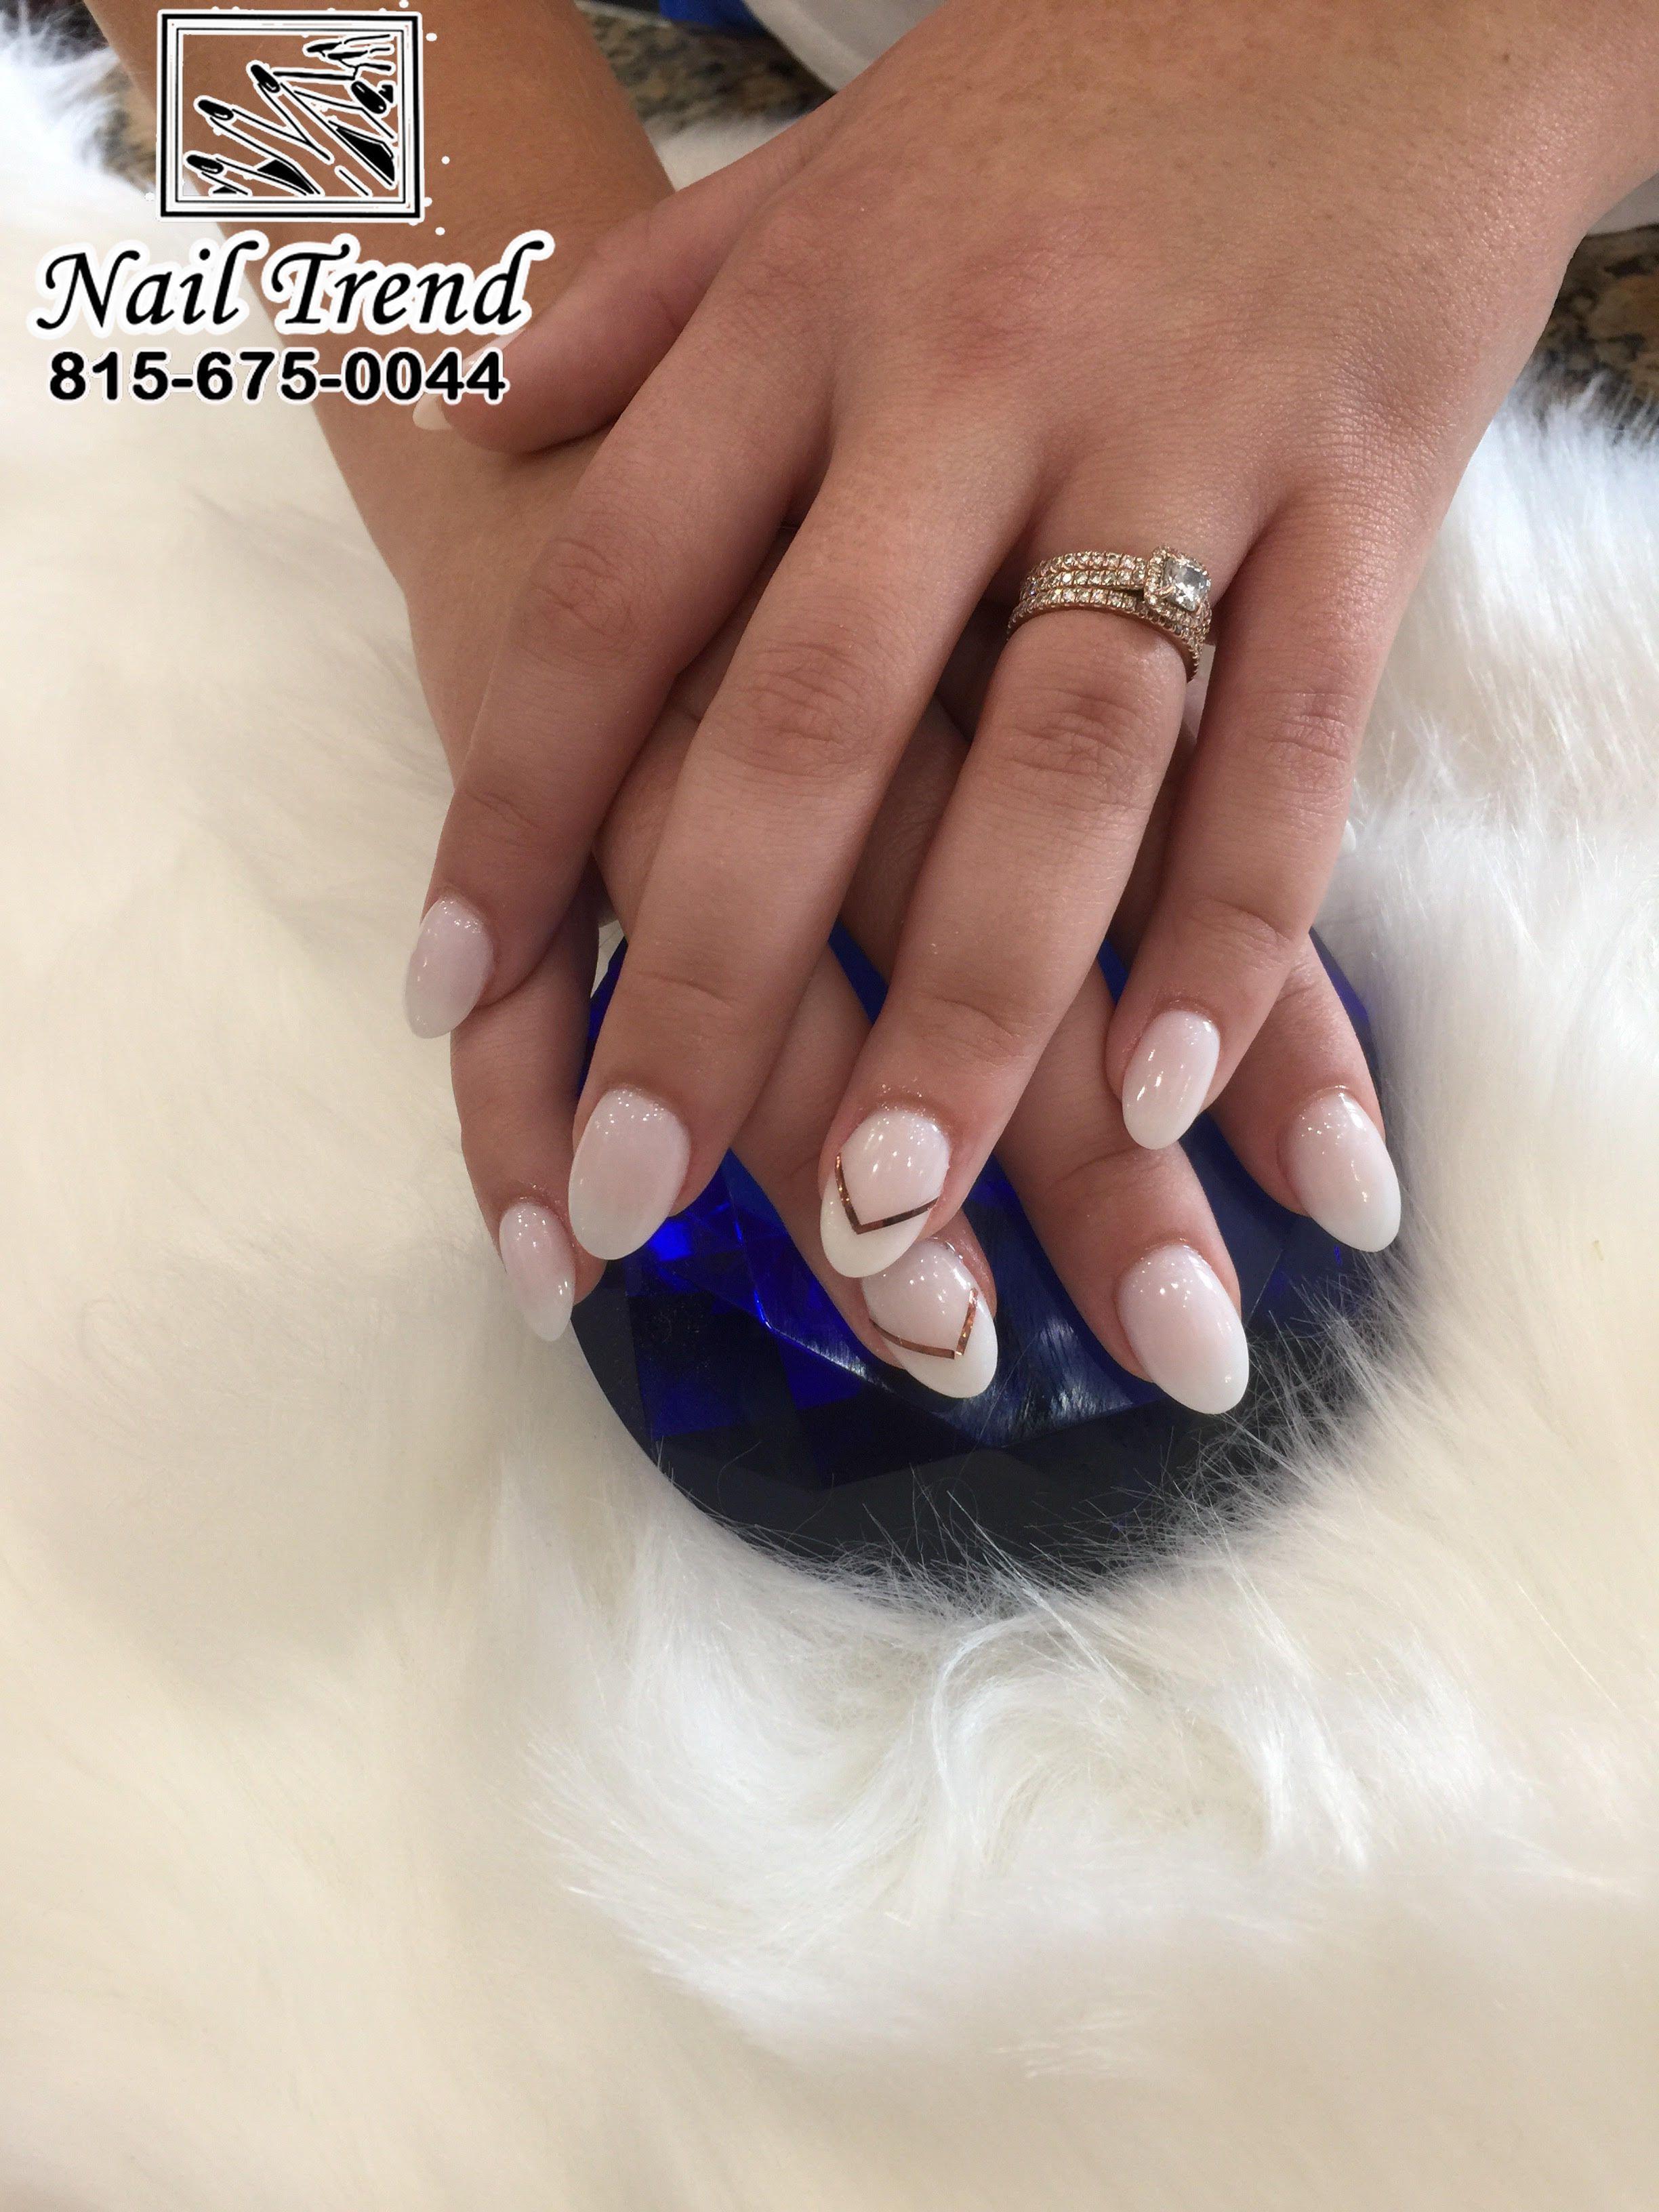 Nail Salon 60081 - Nail Trend - Nail Salon in Spring Grove IL 60081